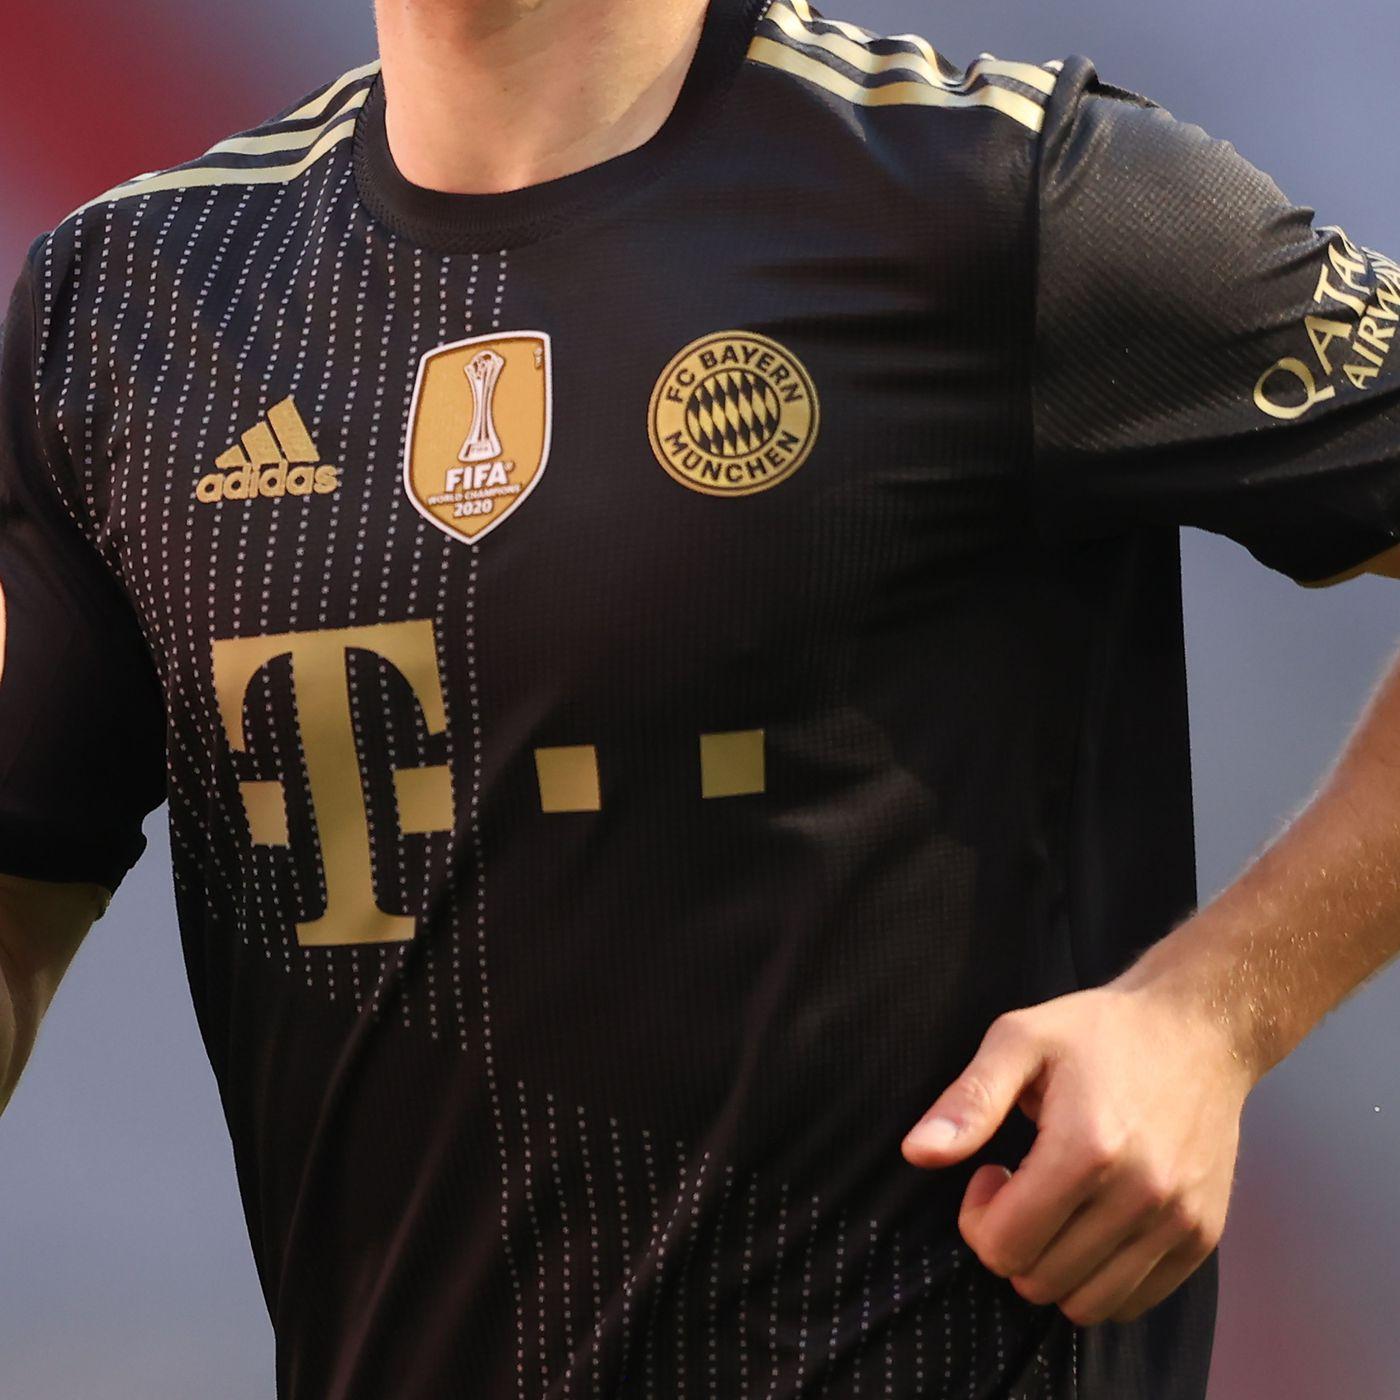 Kit Leak Bayern Munich S Final Design For The 21 22 Home Jersey Bavarian Football Works